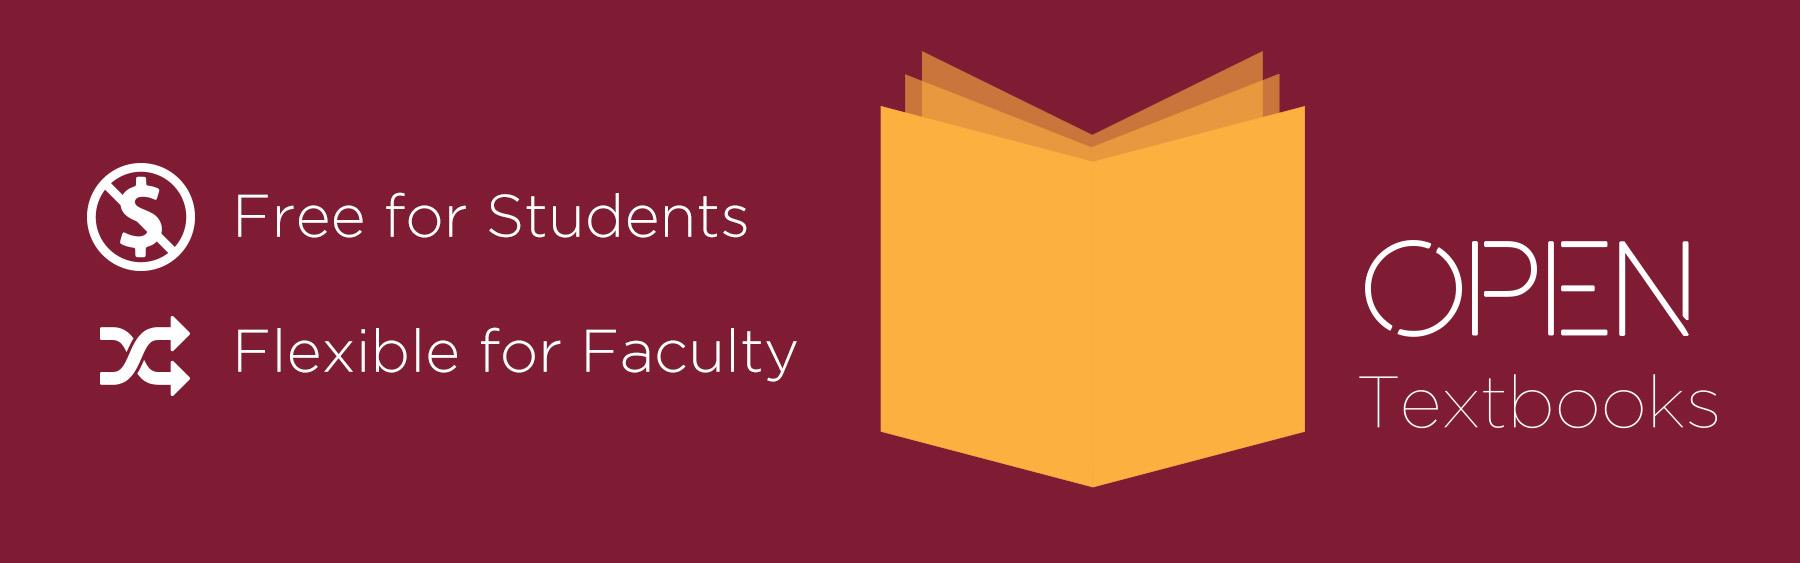 Open textbooks Header